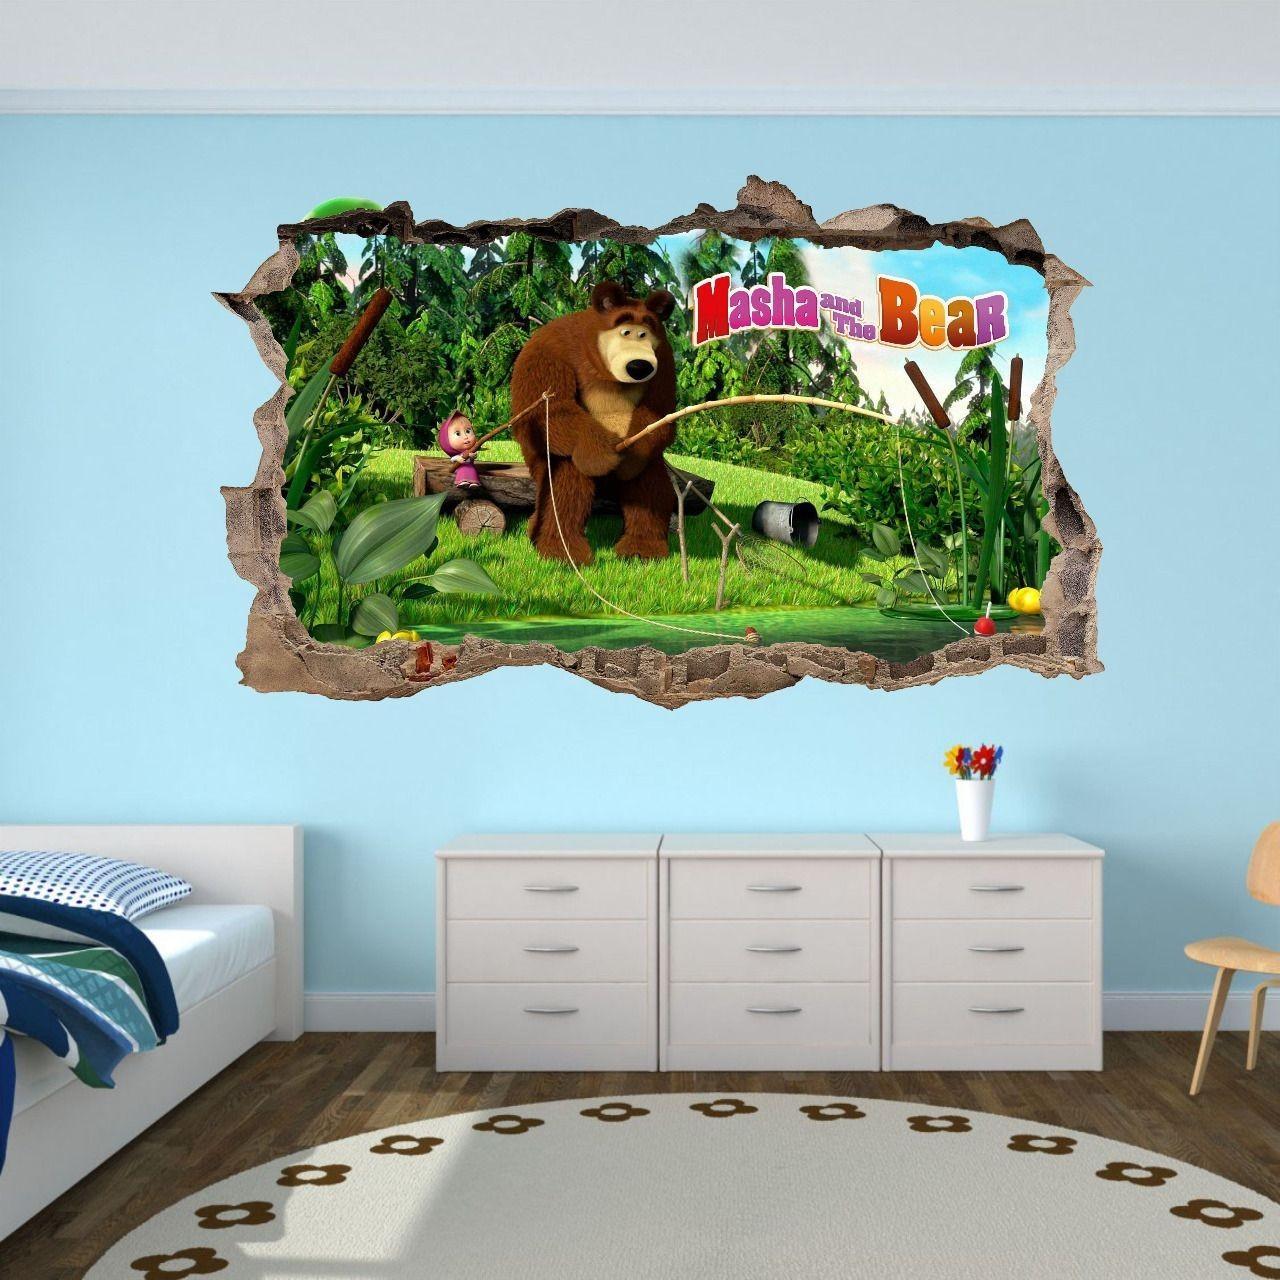 DomTextilu Úžasná detská nálepka na stenu Máša a medveď na rybačke 47 x 77 cm 46701-217765